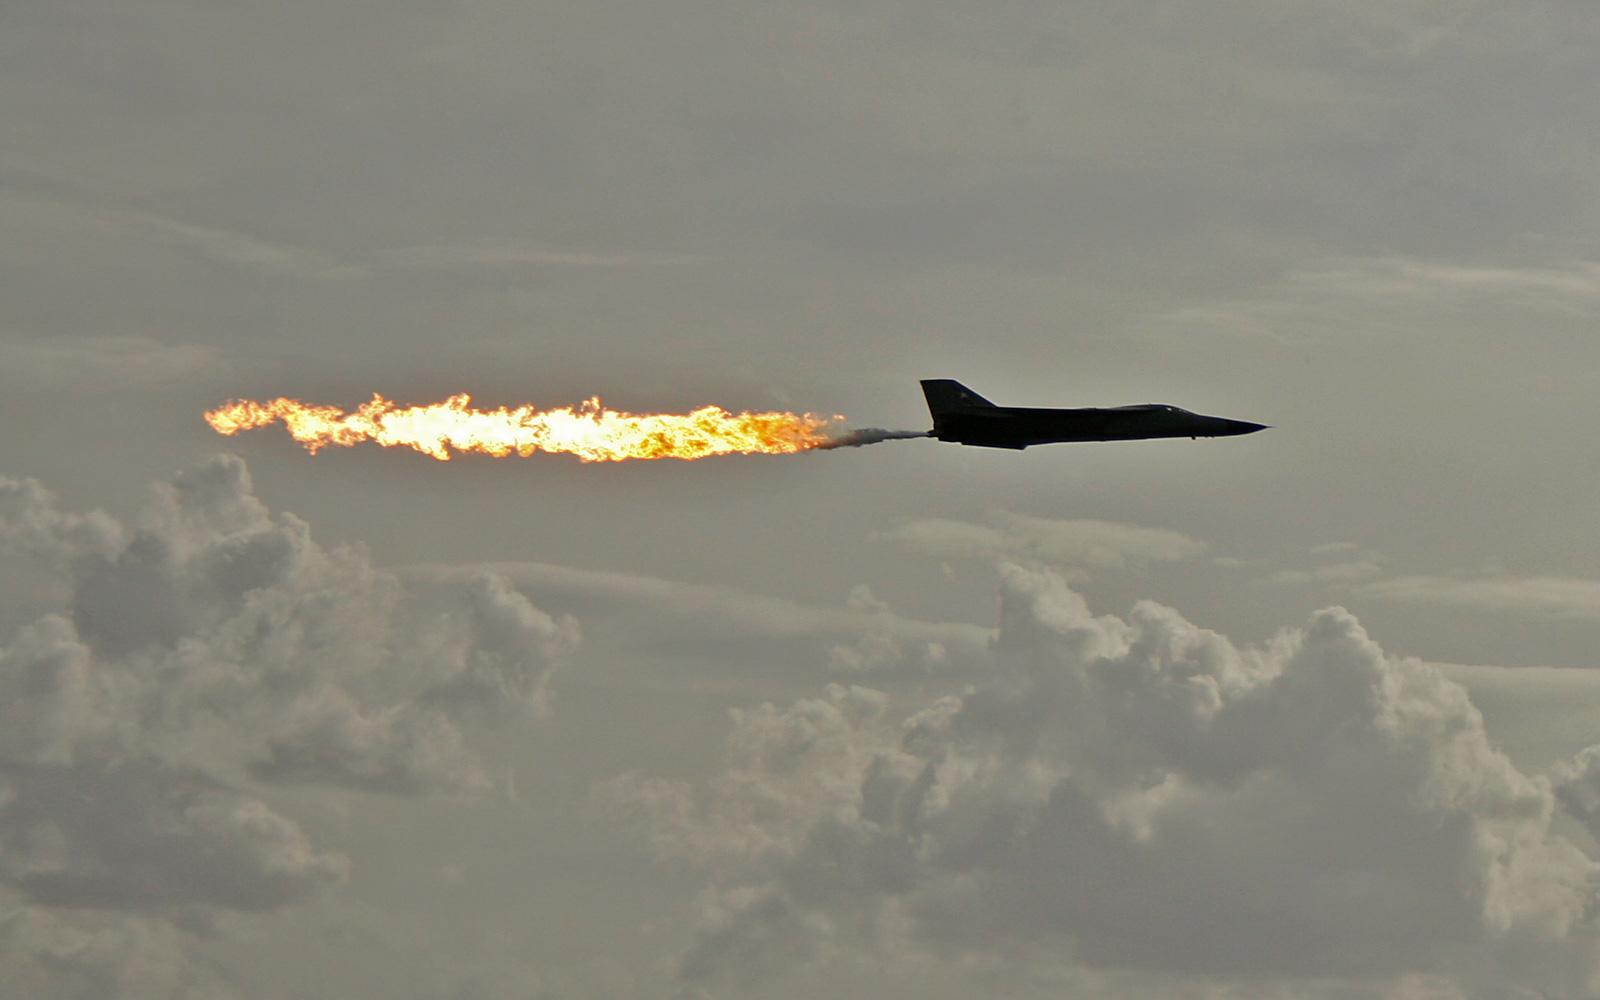 http://upload.wikimedia.org/wikipedia/commons/9/9b/F-111-Fuel-Dump,-Avalon,-VIC-23.03.2007.jpg